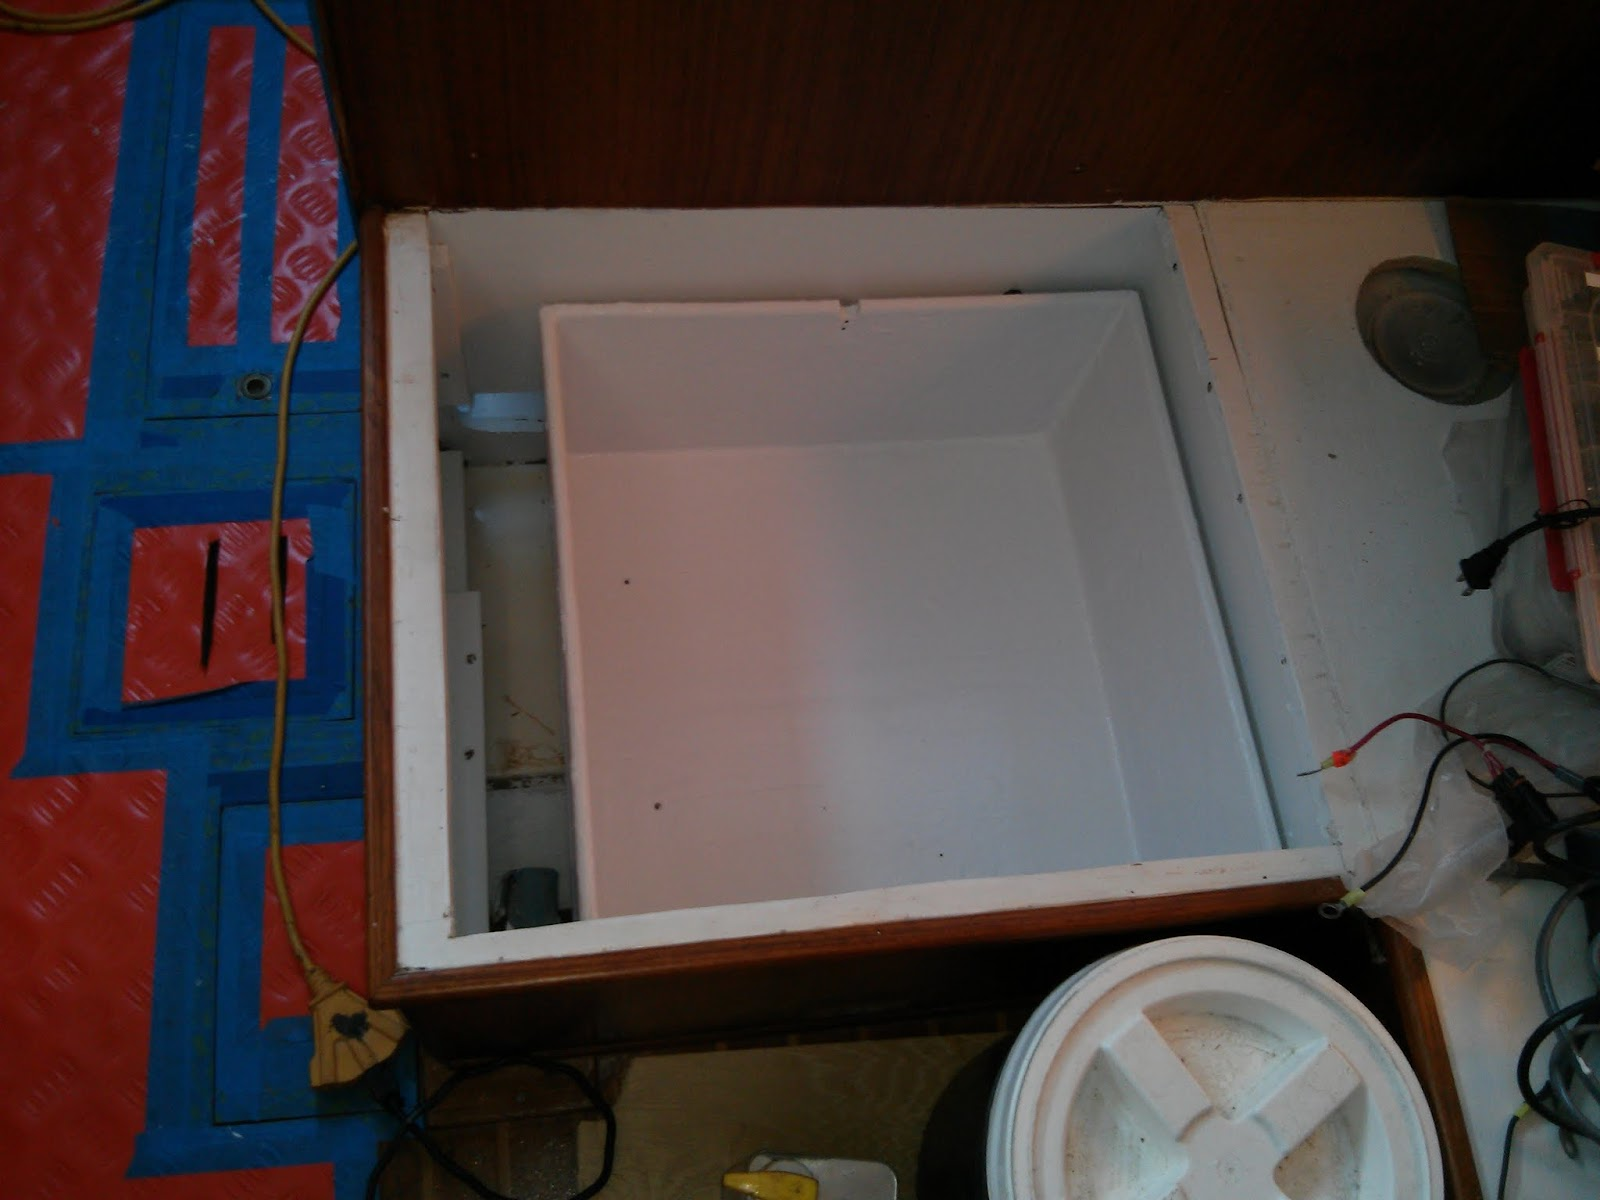 2014 04 10%2B08.08.16 sv pilgrim securing the house battery bank lovett bilge pump wiring diagram at webbmarketing.co